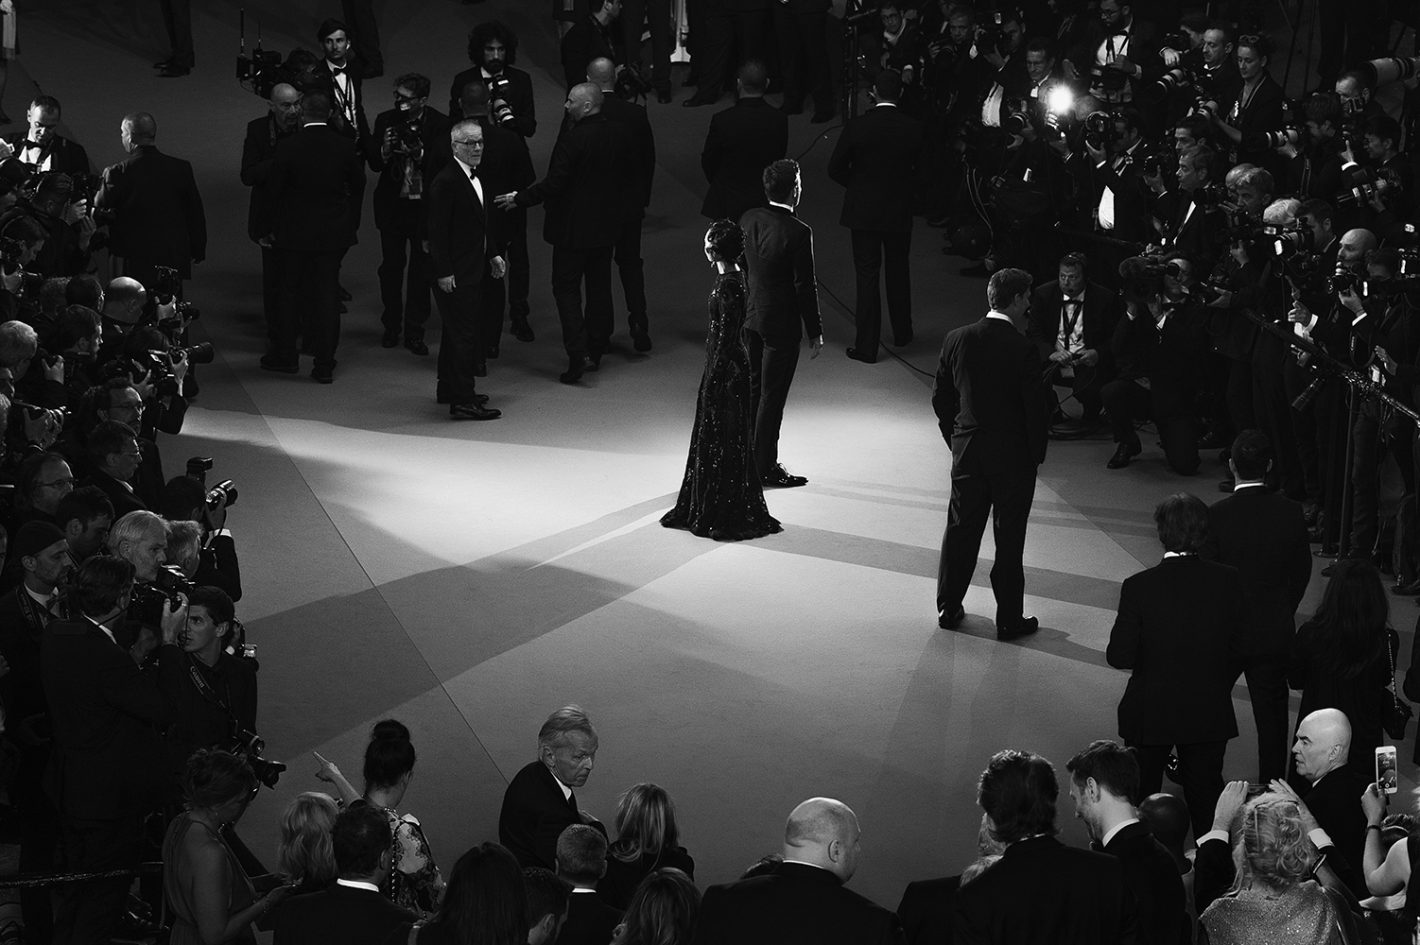 Festival de Cannes 2016 - Joel Edgerton & Ruth Negga - Nikon D4S